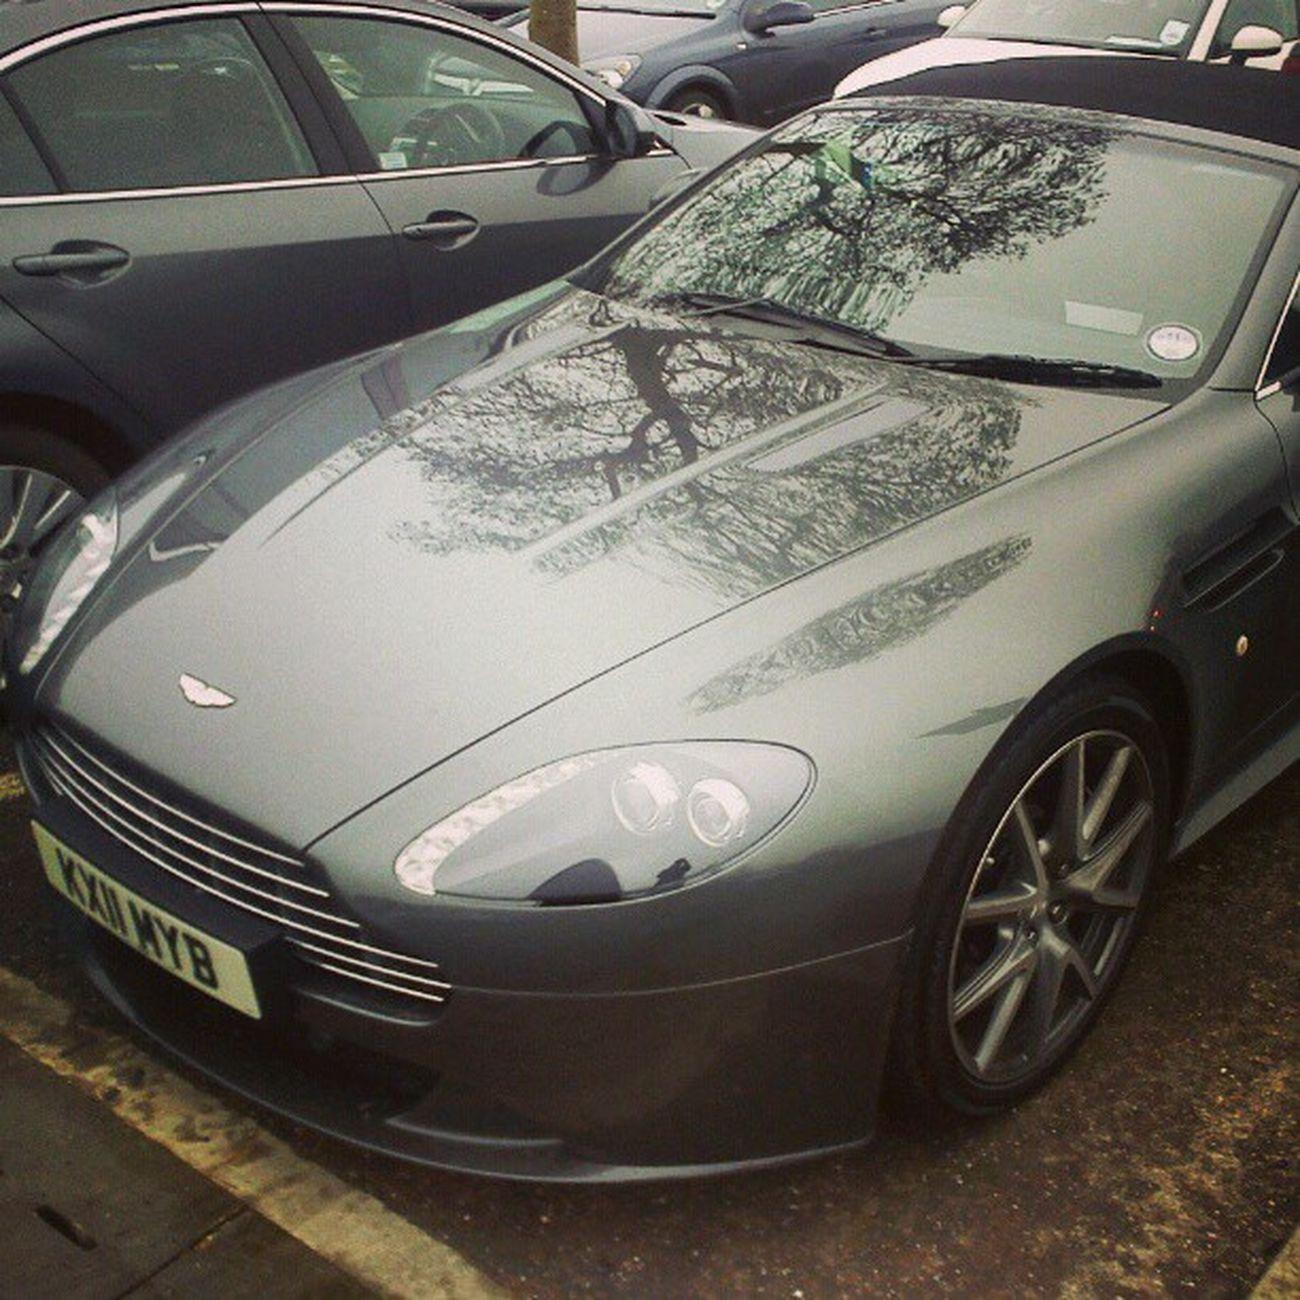 Aston Martin Fast Car expensive bicester village likeforlike like4like followforfollow follow4follow Instagram